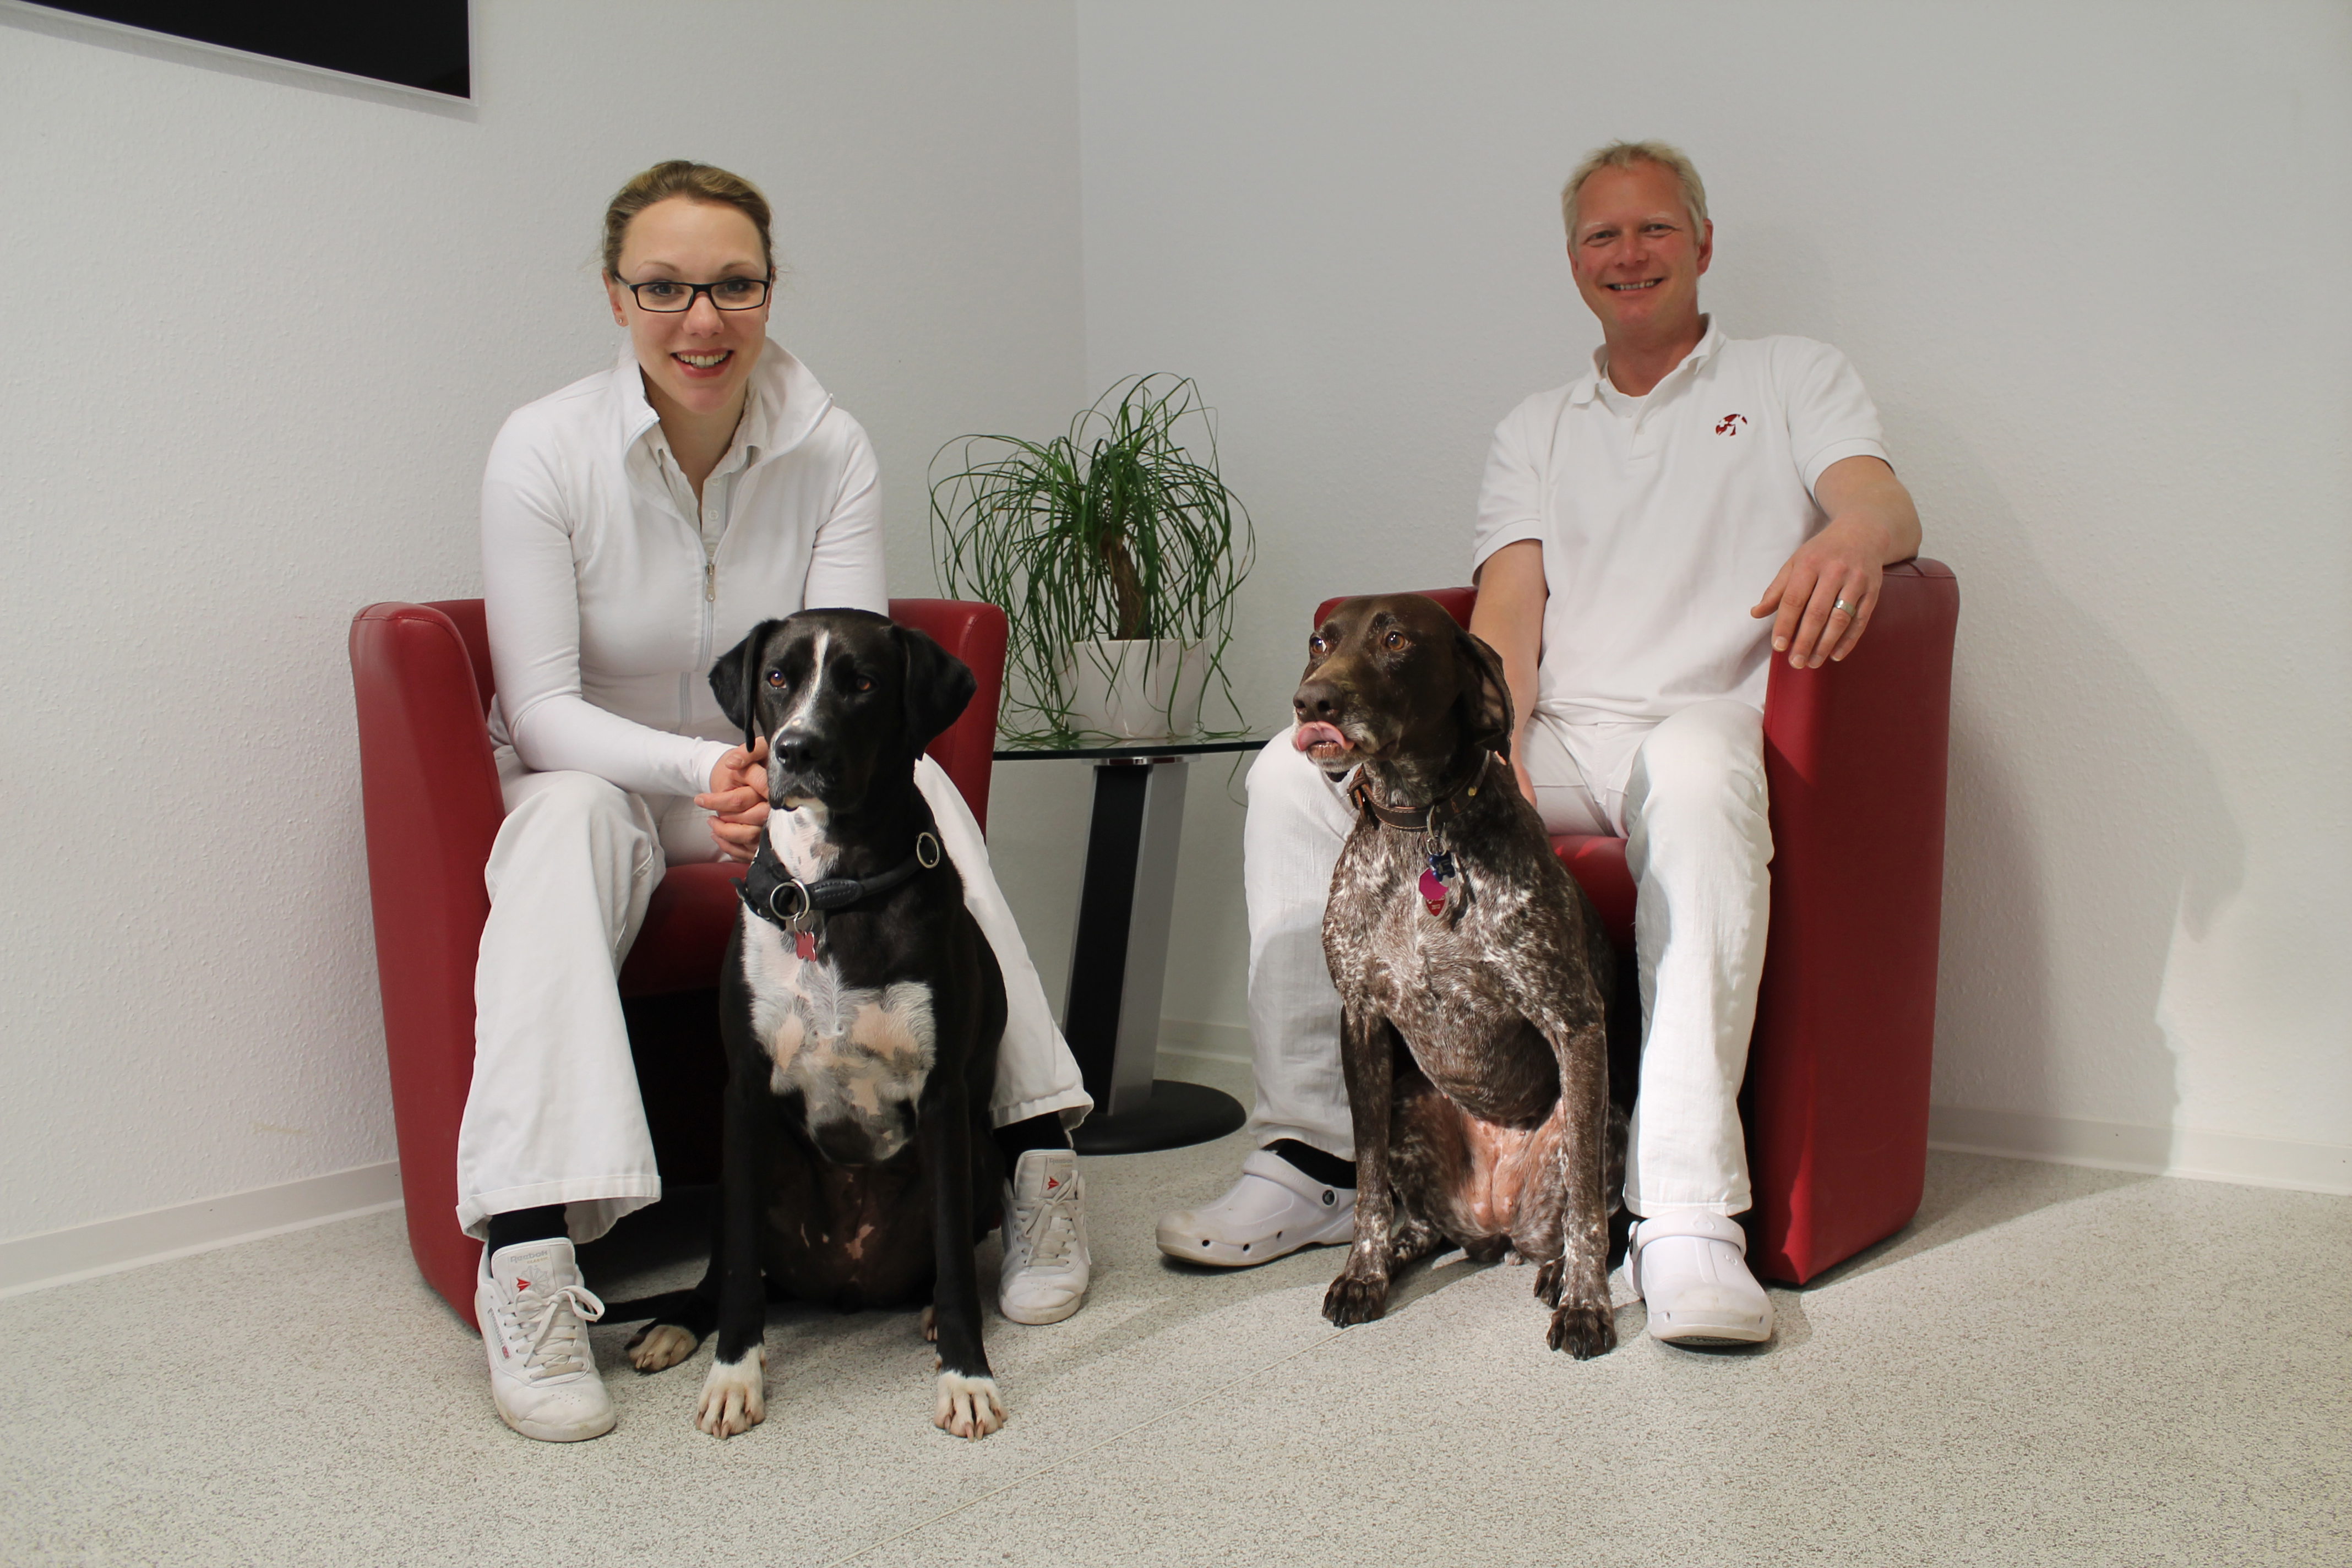 Valerie Flach & Olaf Hattenhauer